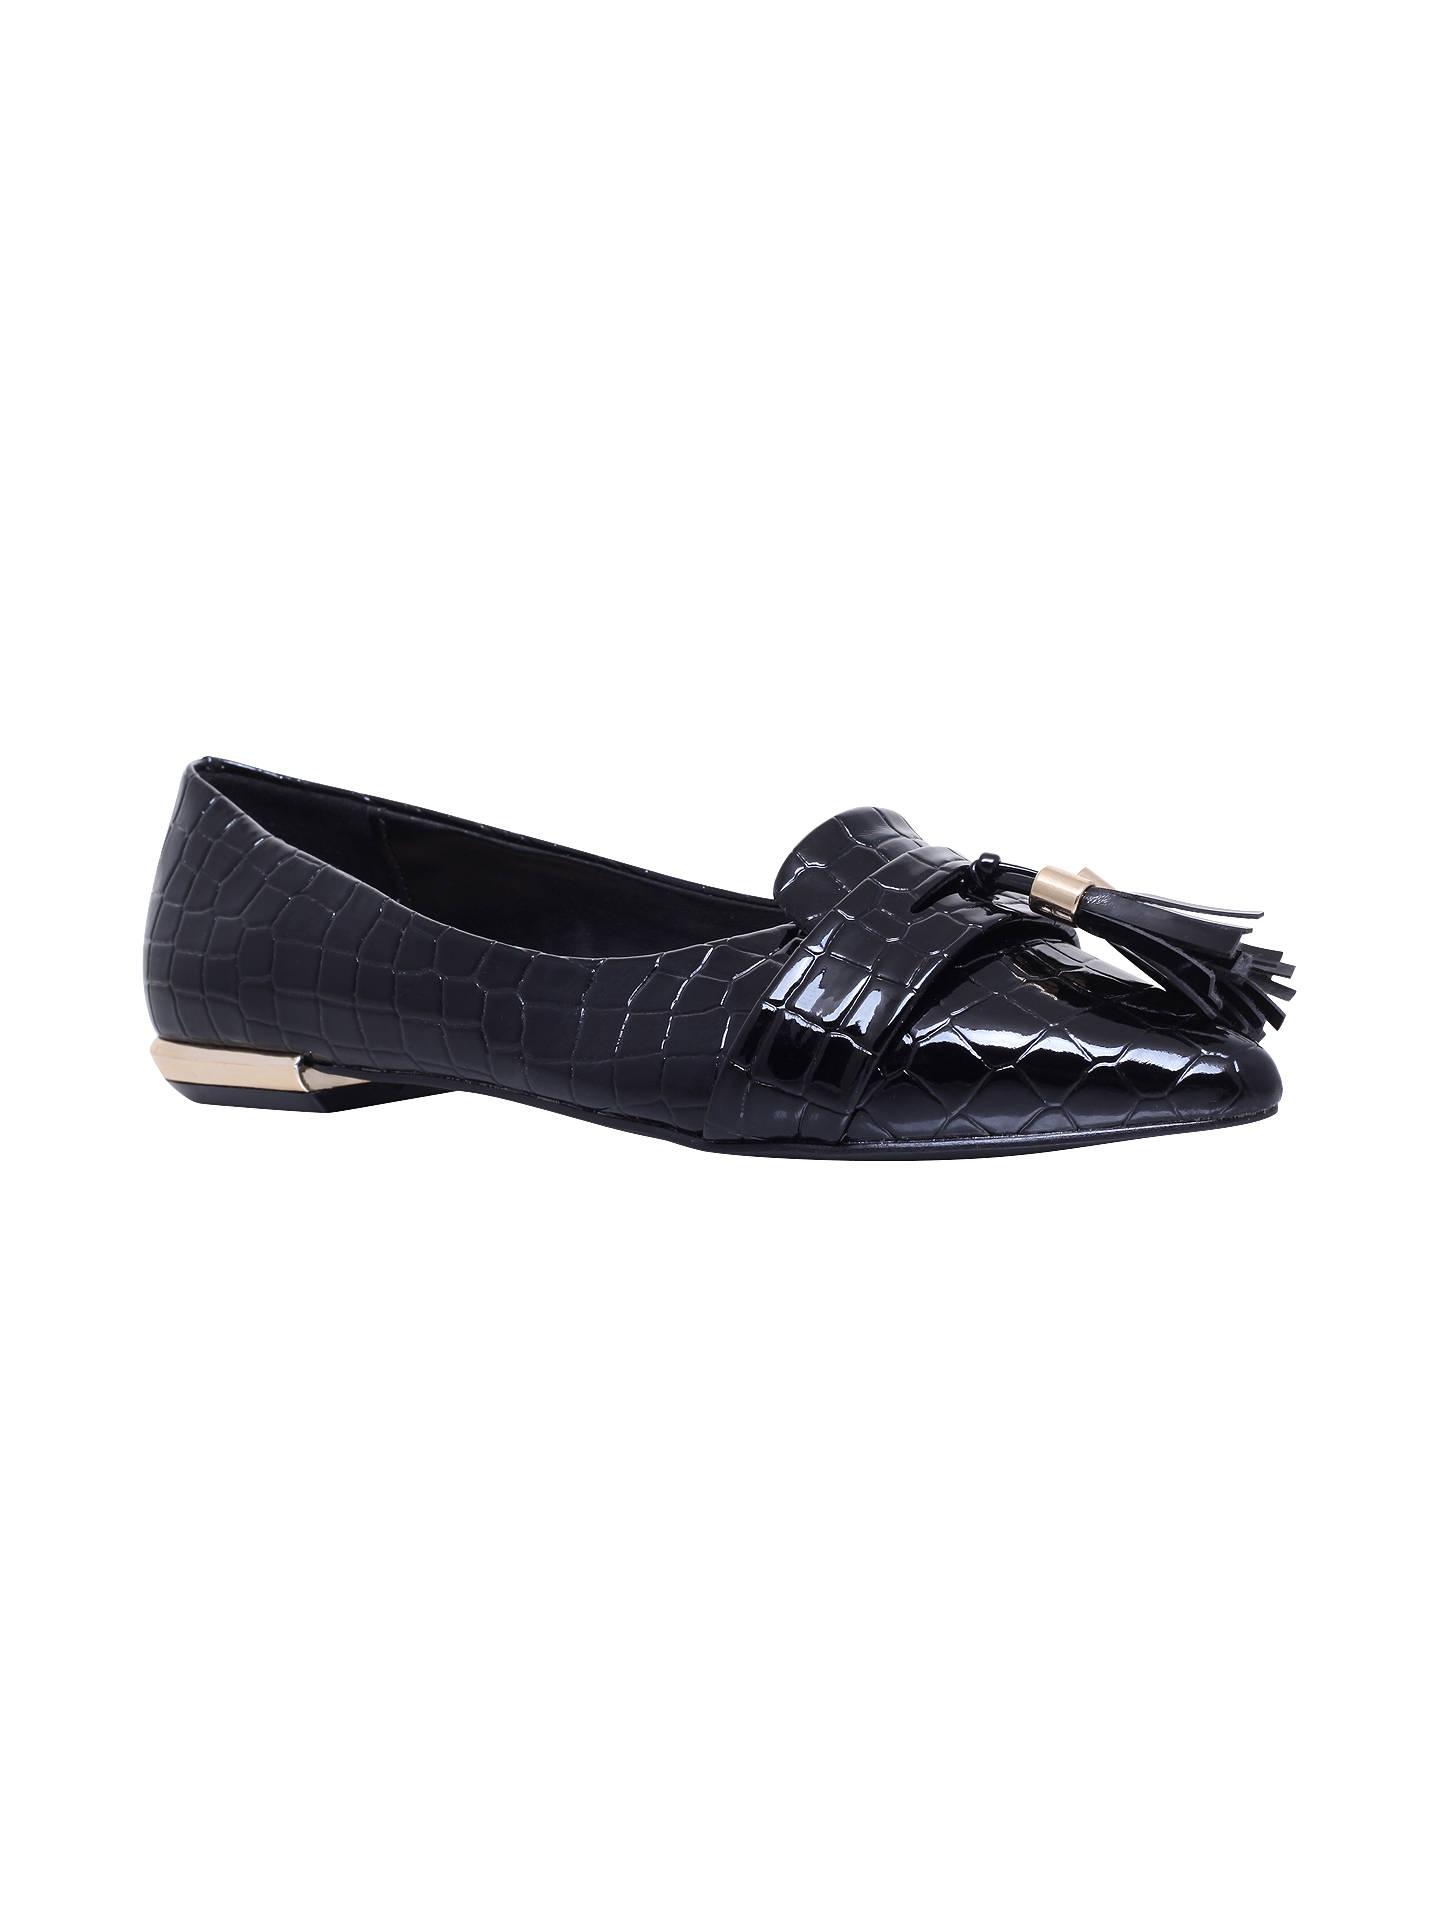 cc9166c457 Buy Miss KG Nikki Tassel Pointed Flat Court Shoes, Black, 3 Online at  johnlewis ...